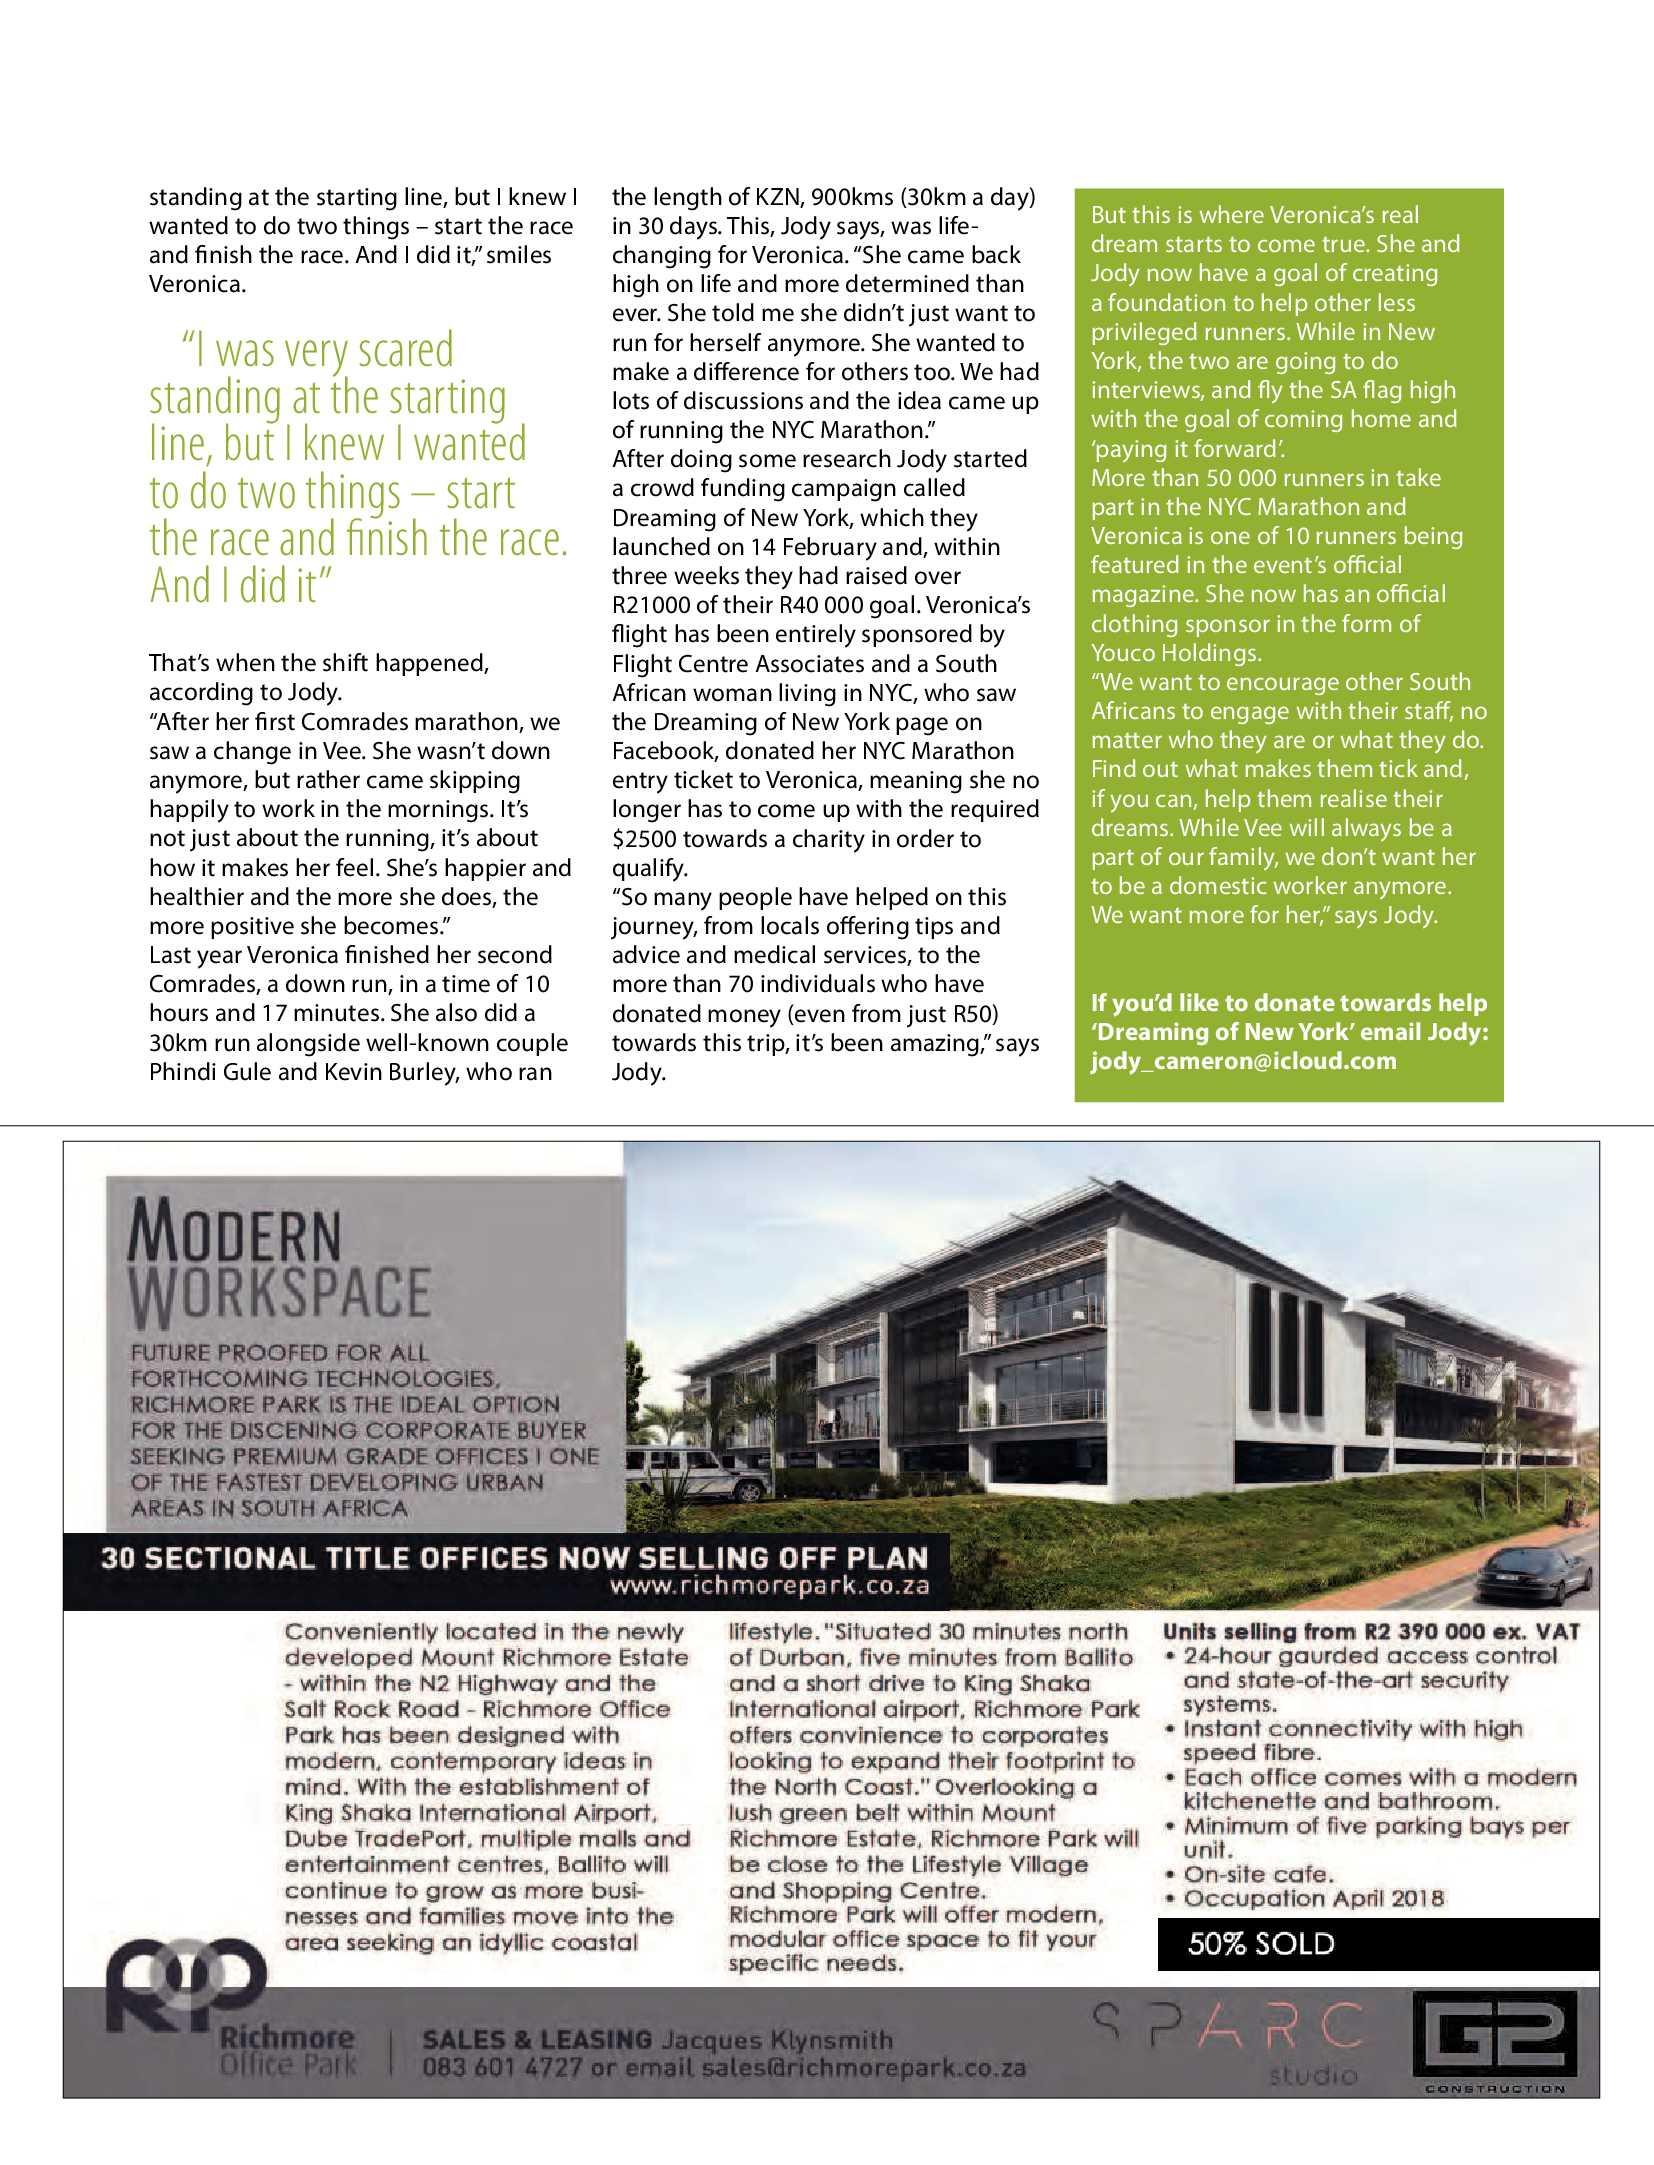 get-magazine-ballitoumhlanga-may-2017-epapers-page-21